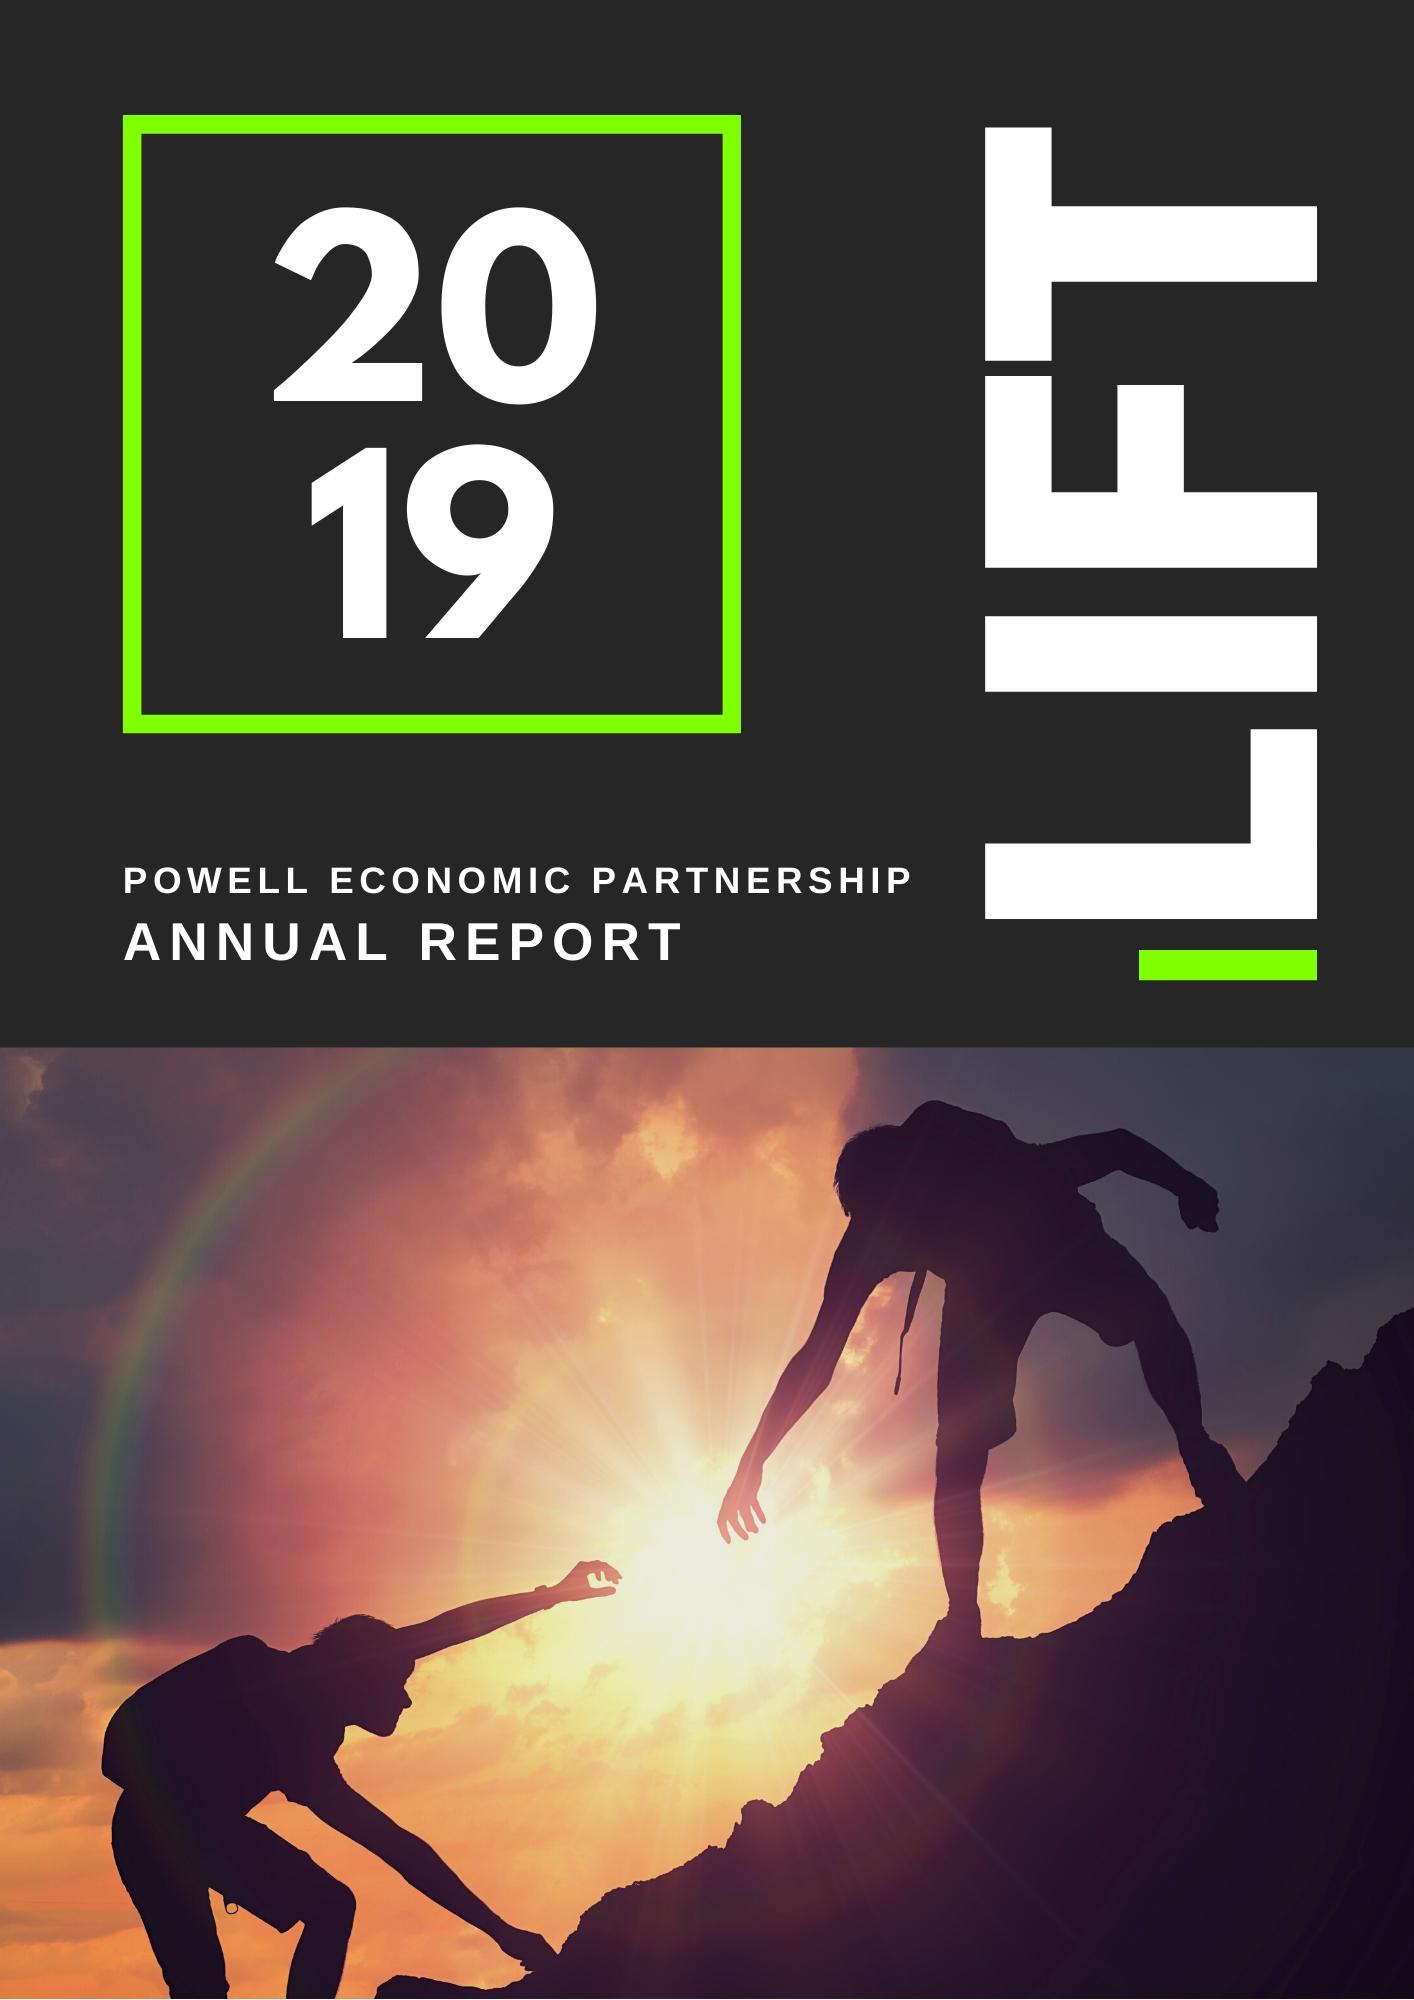 PEP Annual Report 2019